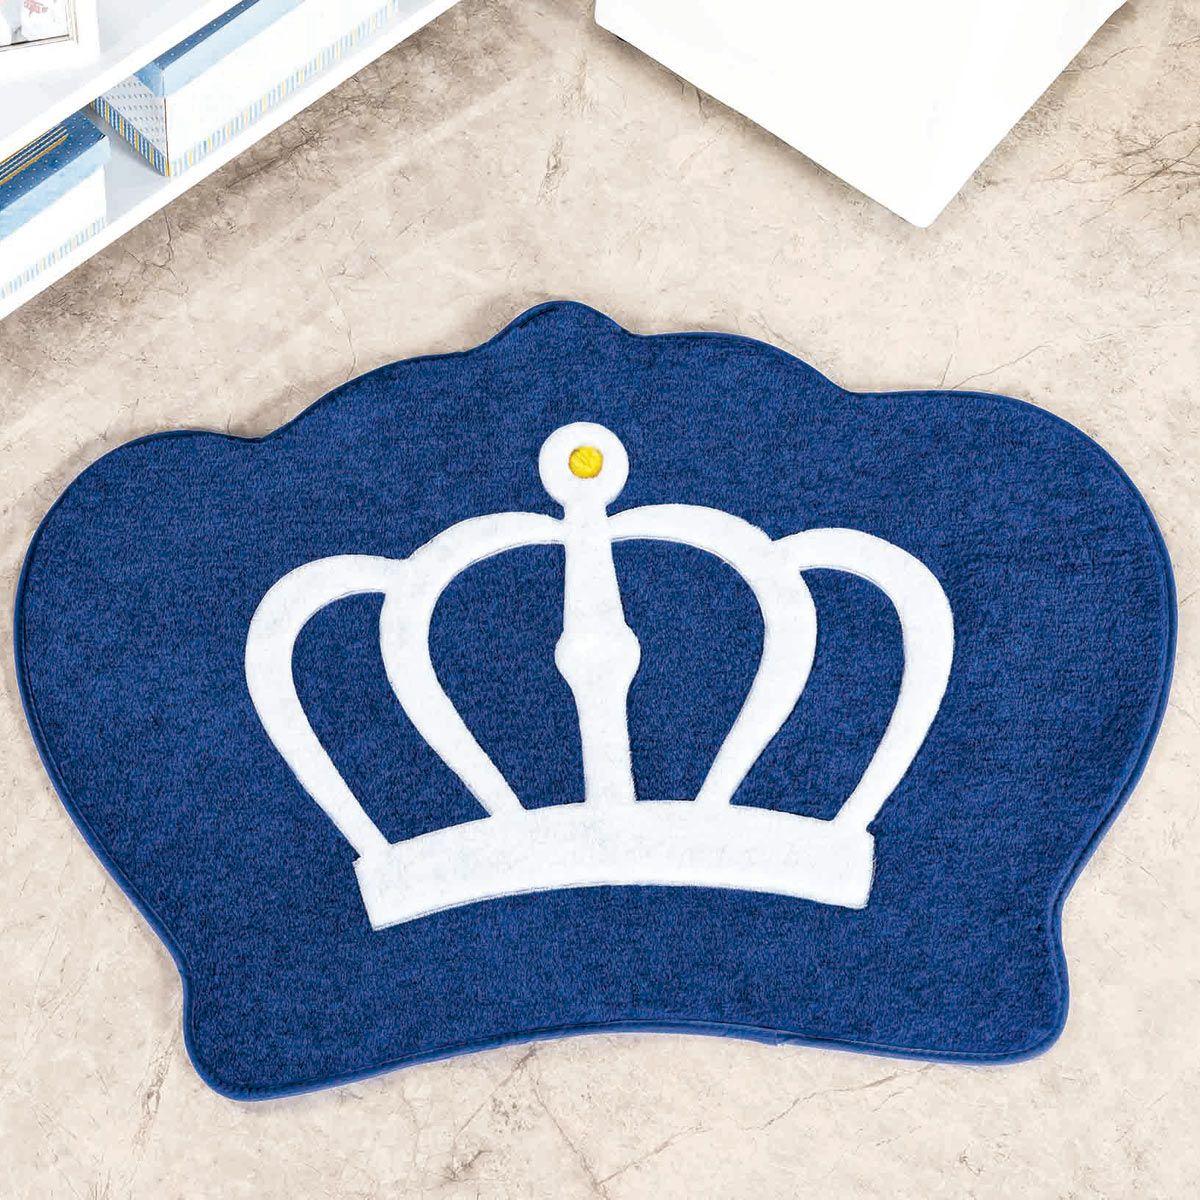 Tapete Big Infantil Premium Formato Coroa Azul Royal 1,16m x 0,90m